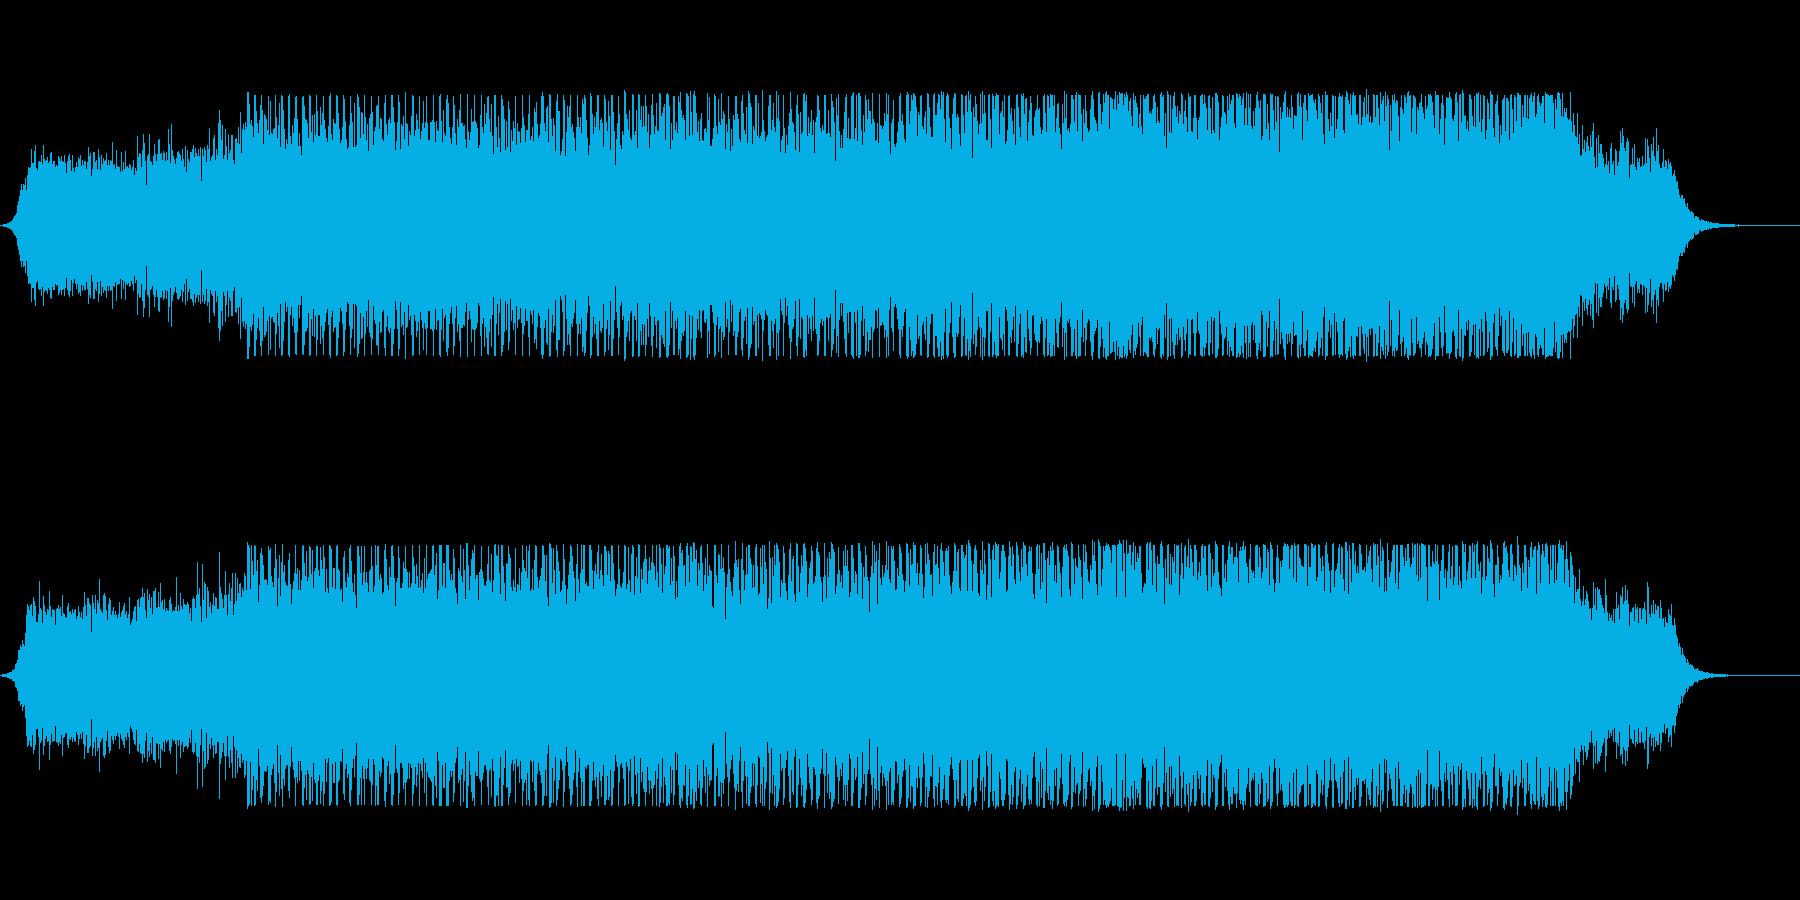 bpm140の不気味な雰囲気のテクノの再生済みの波形